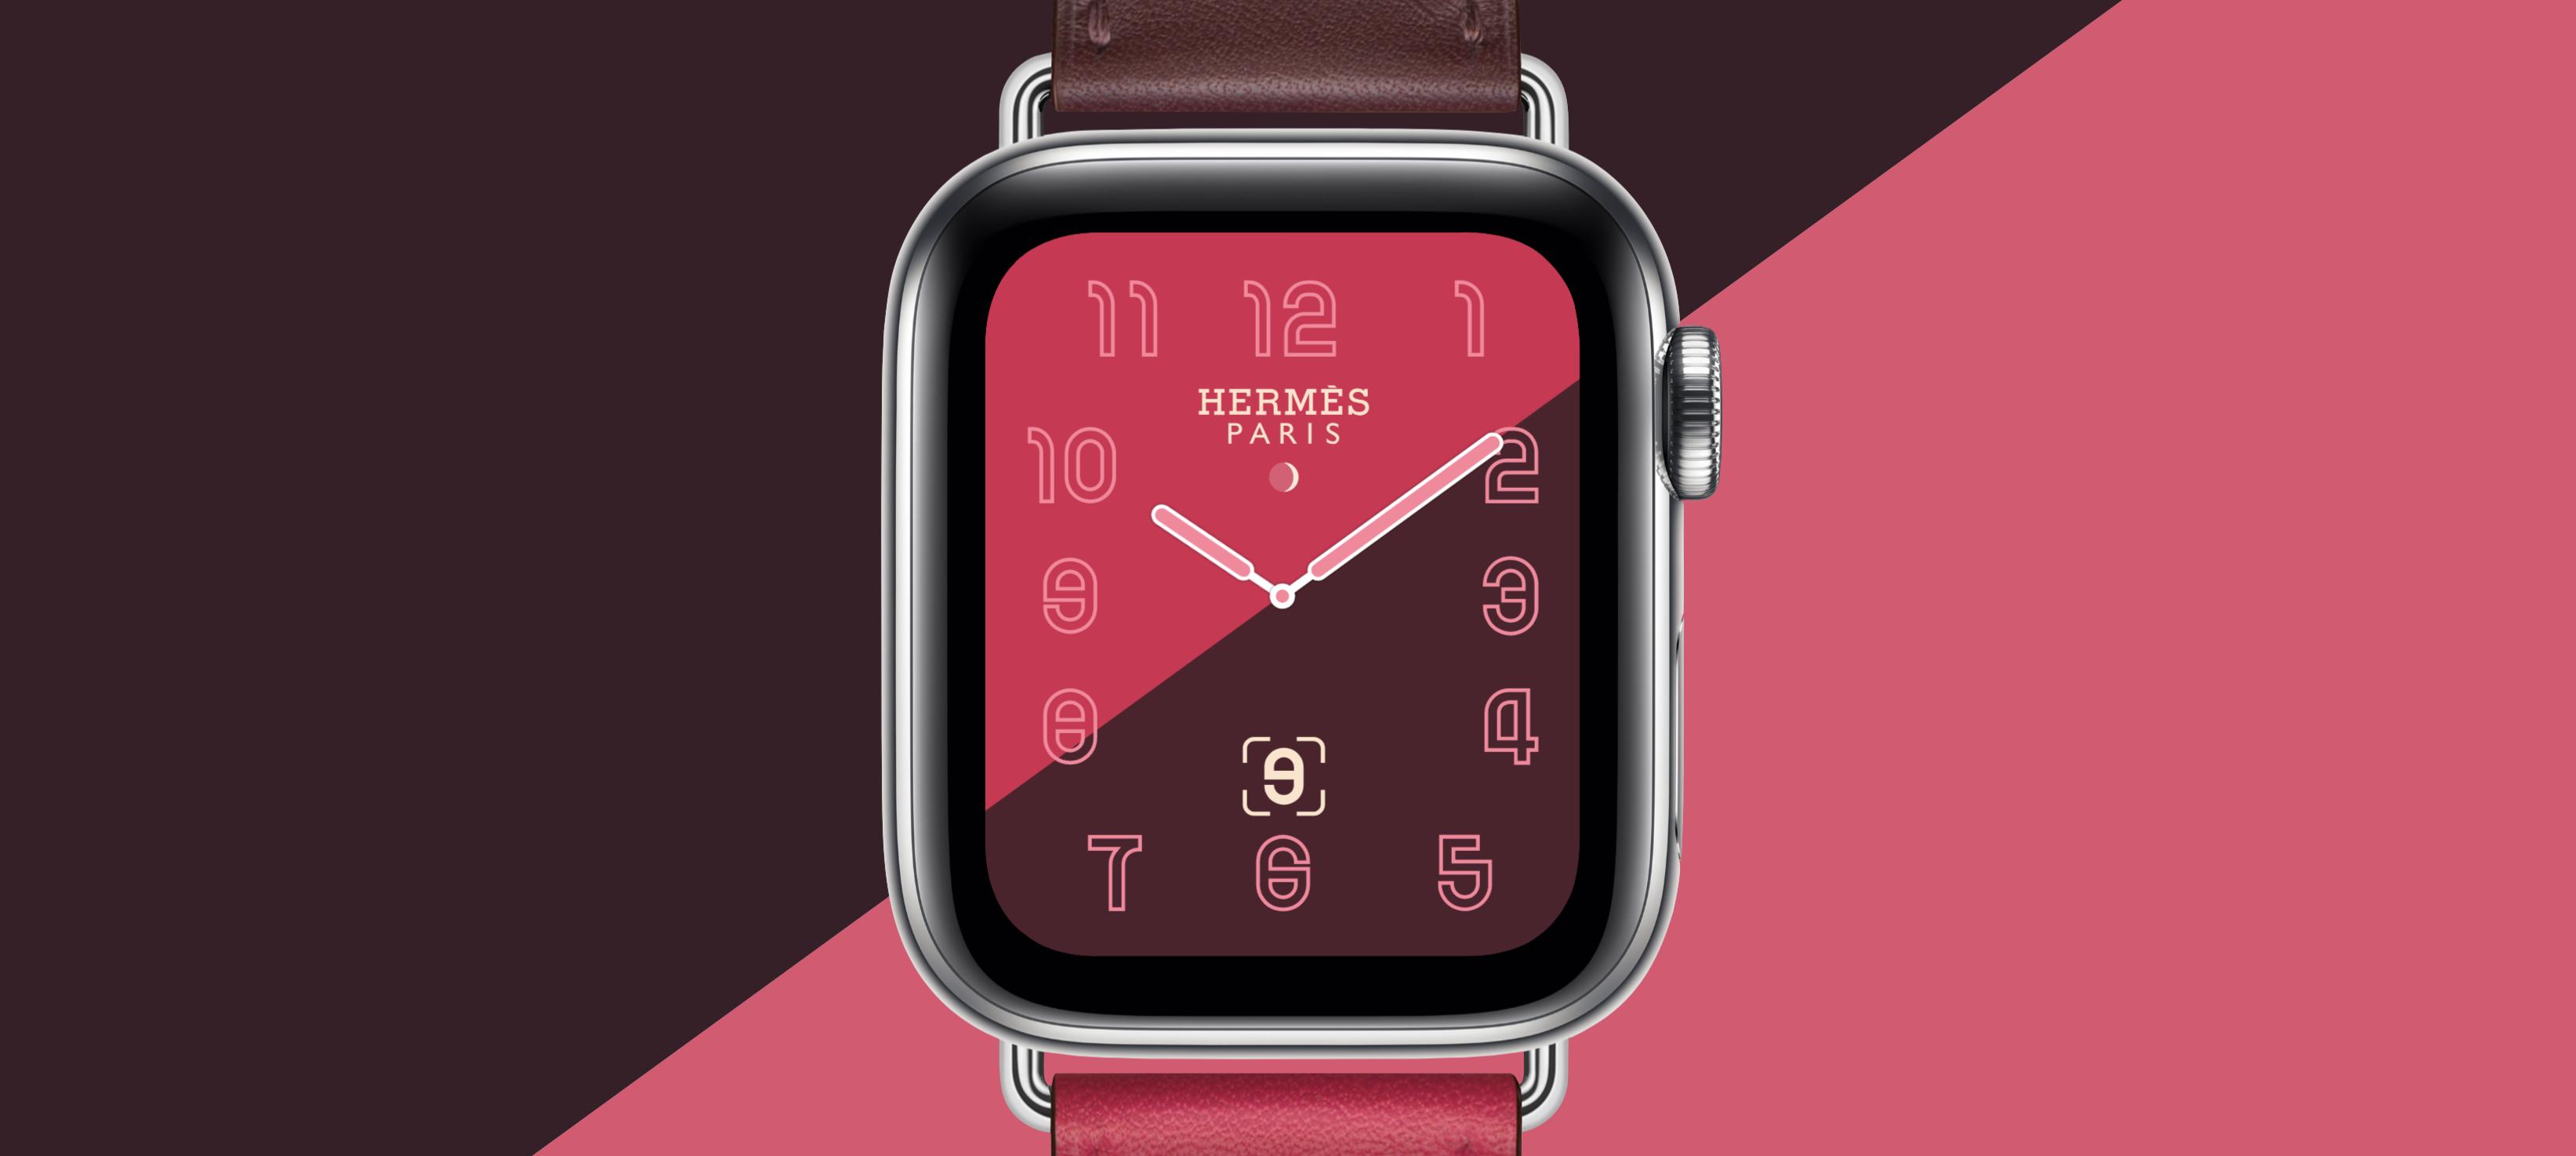 Sfondo hermes per apple watch